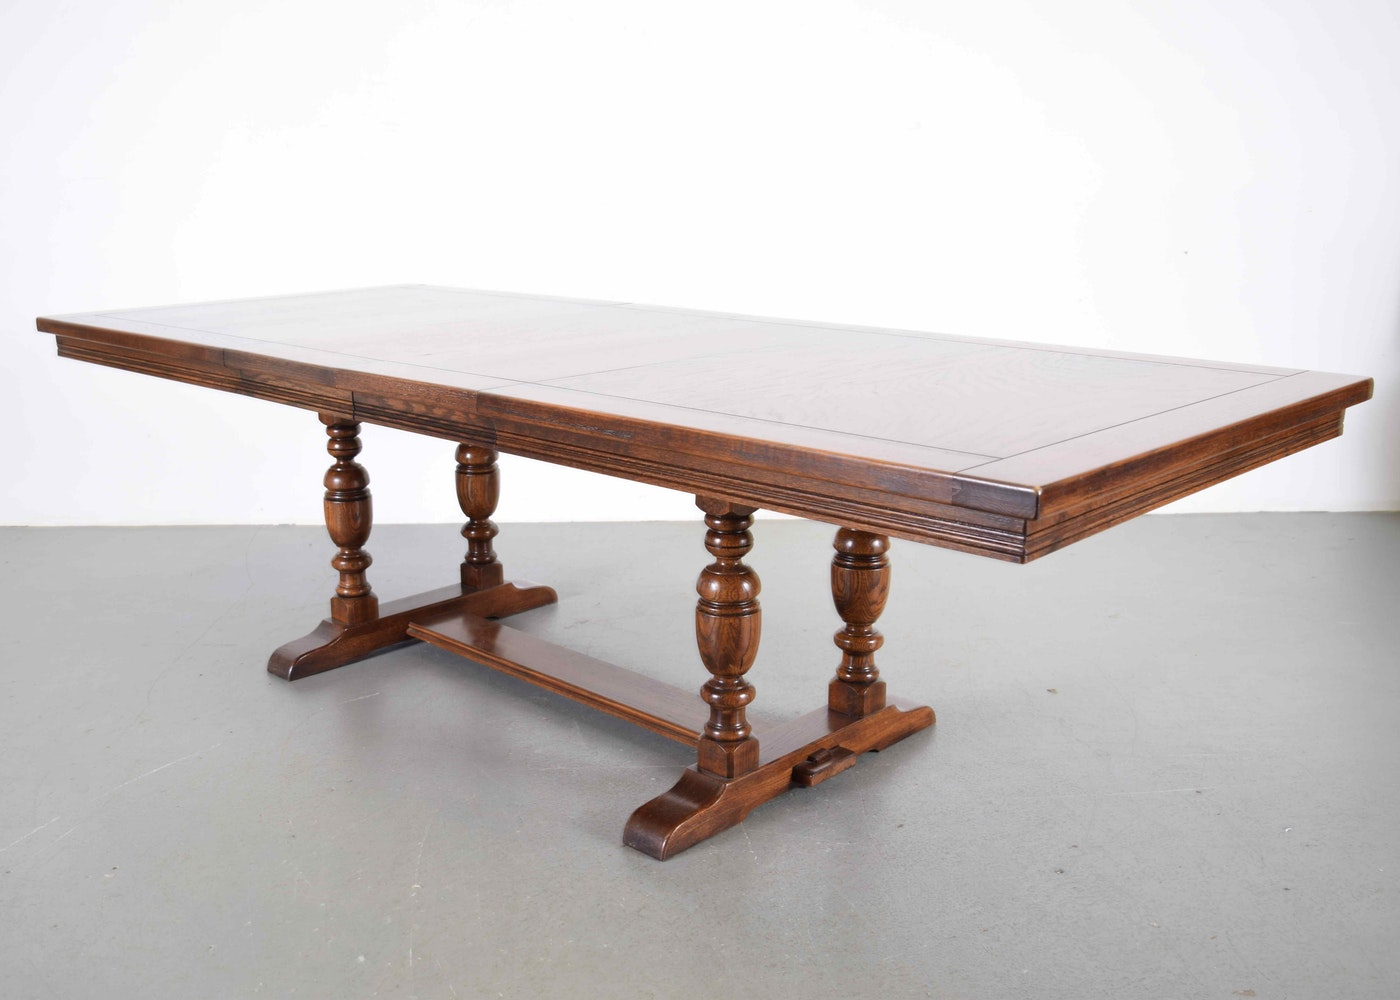 Ethan Allen Royal Charter Oak Trestle Table Ebth